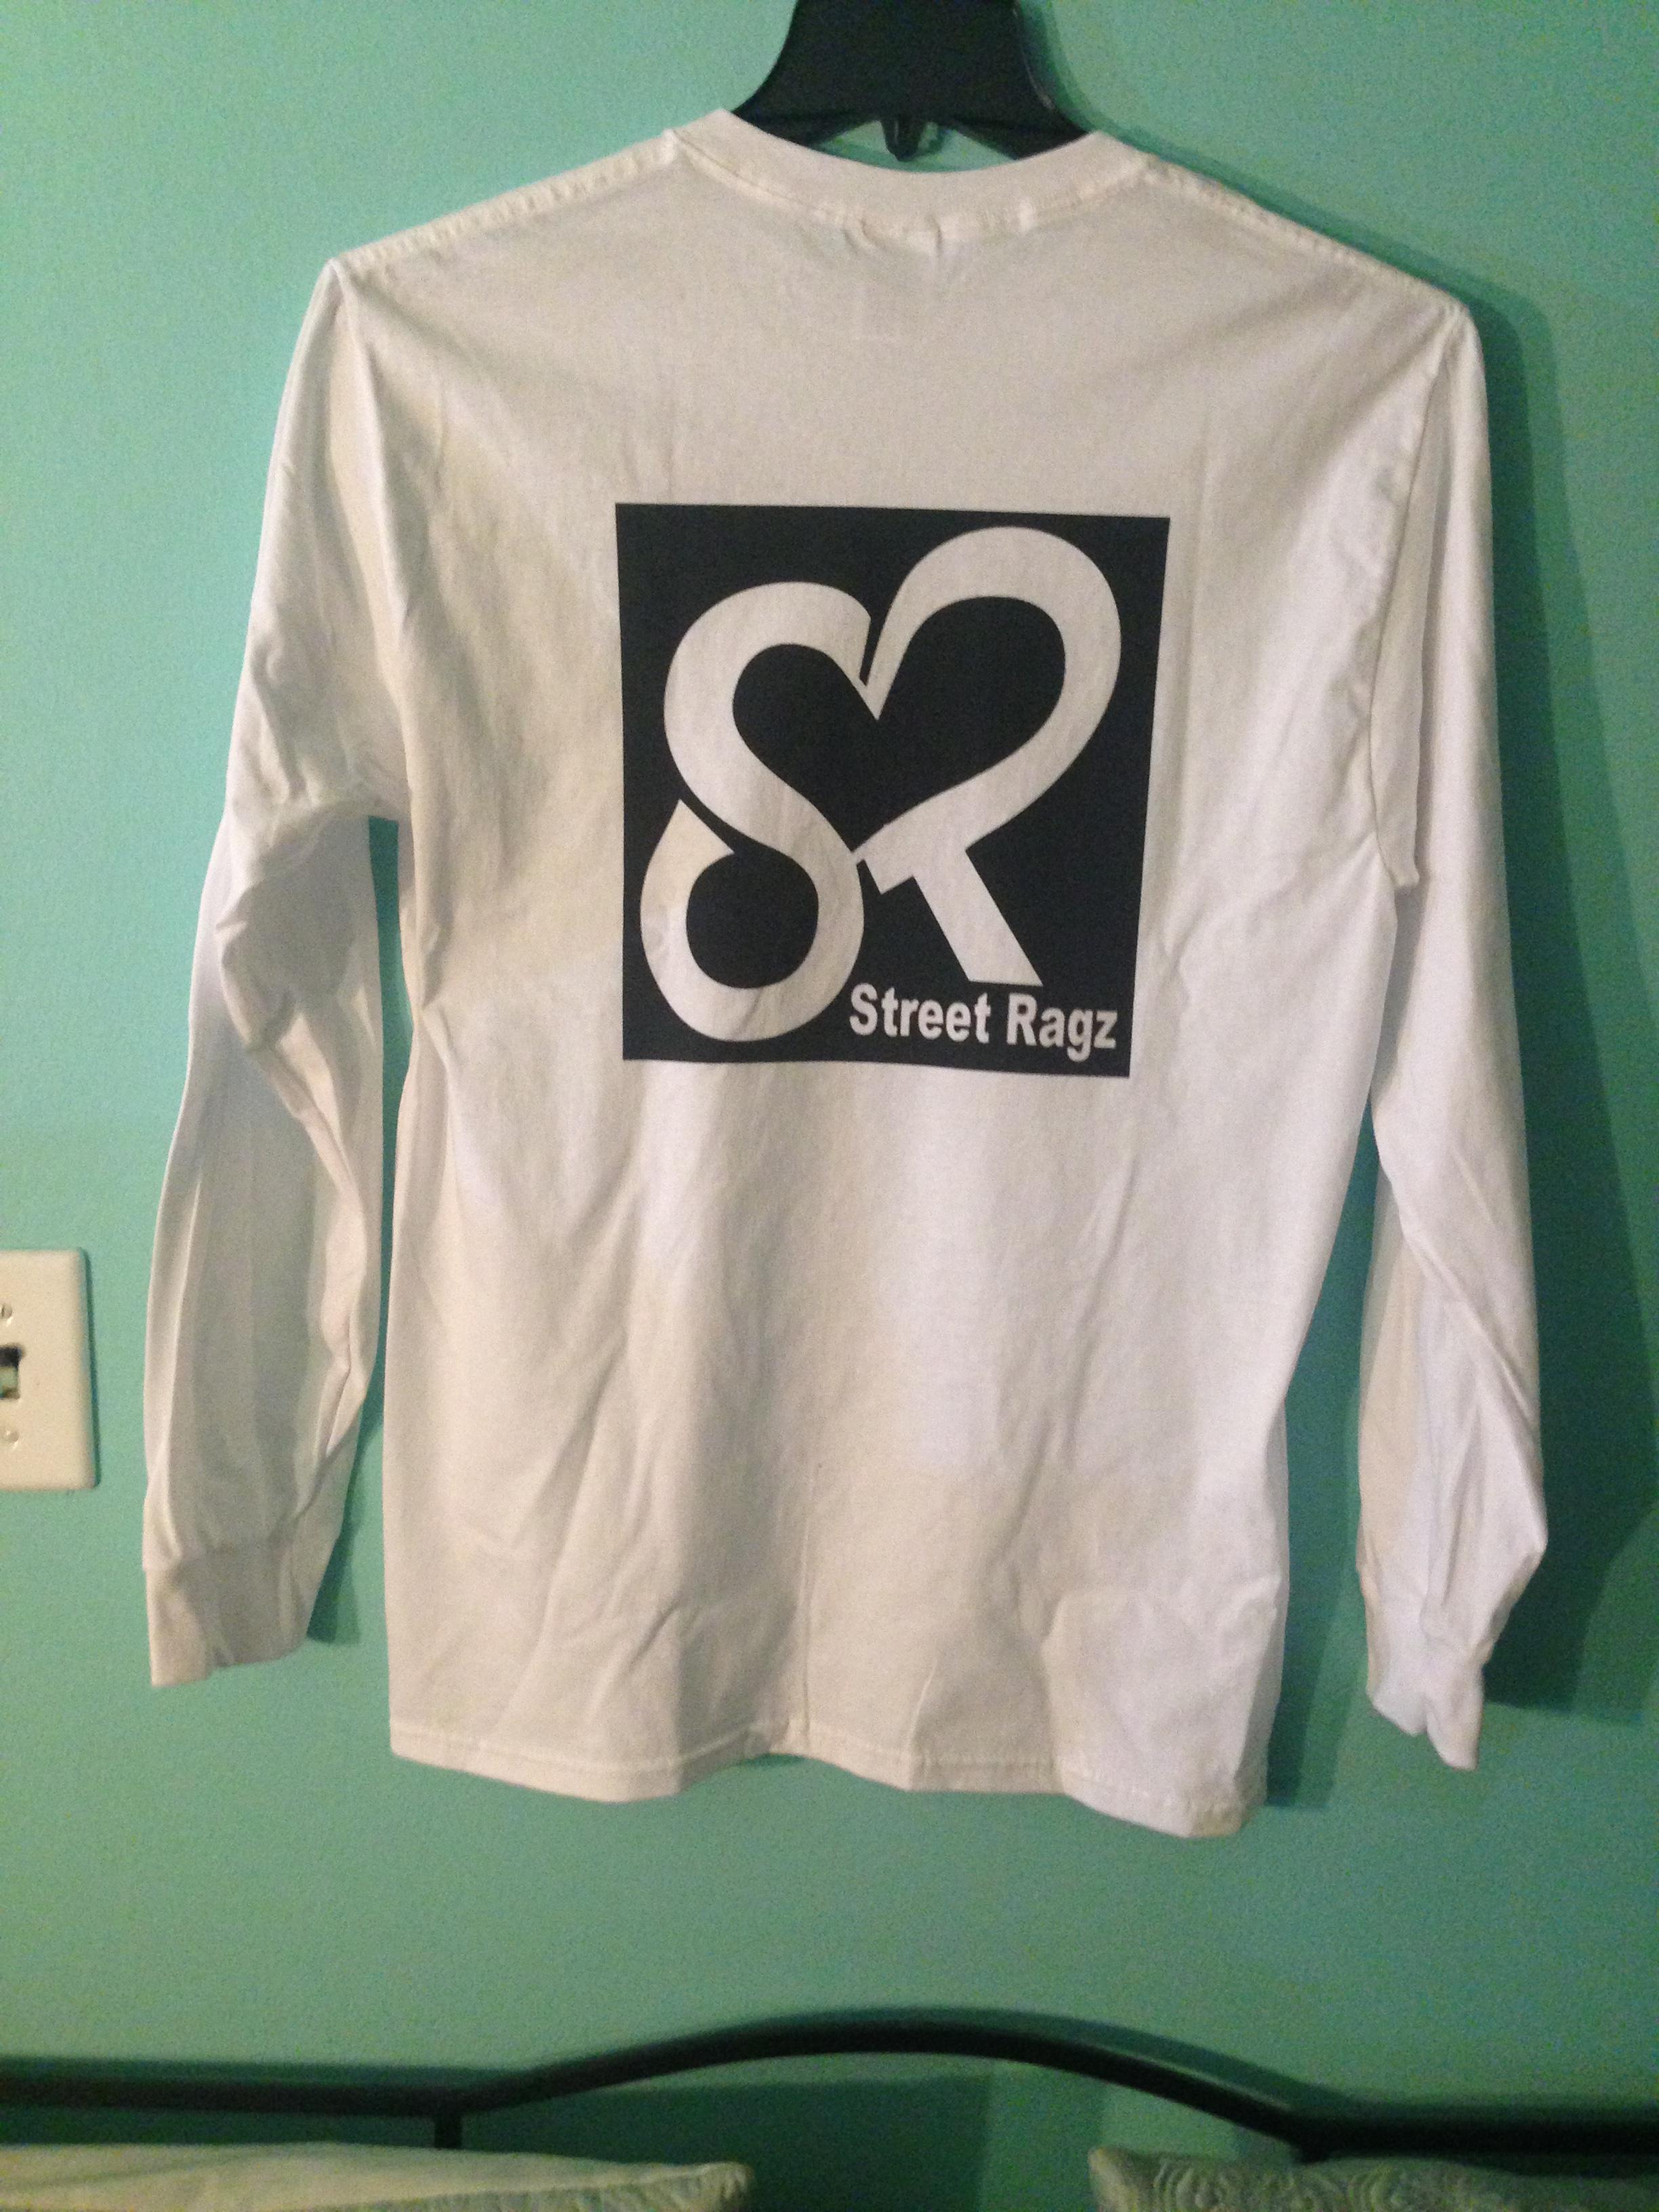 Street Ragz (SR) longsleeves Tee-shirt black logo